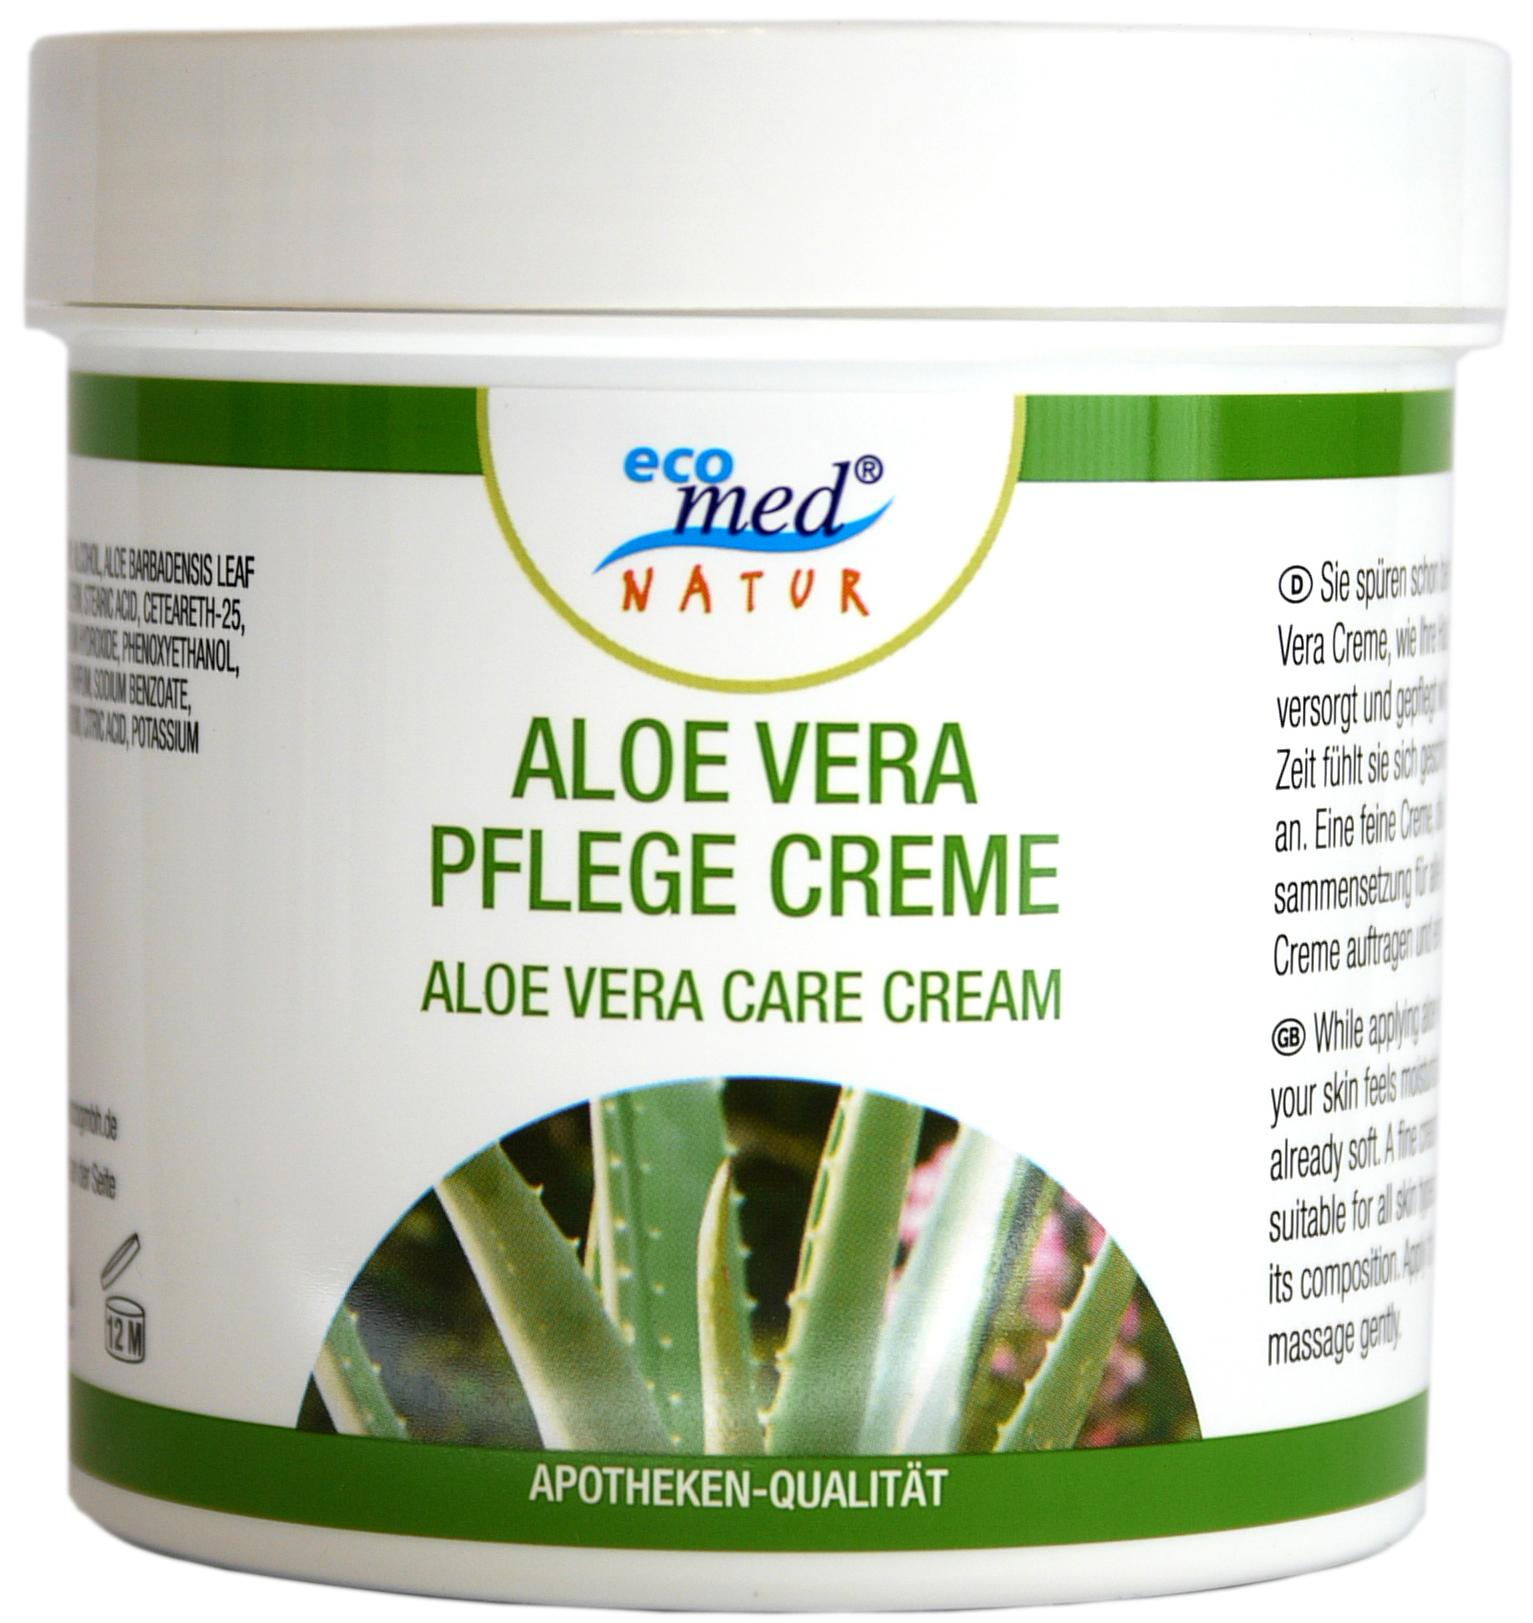 01840 - eco med Natur Aloe Vera Pflege Creme 220 ml